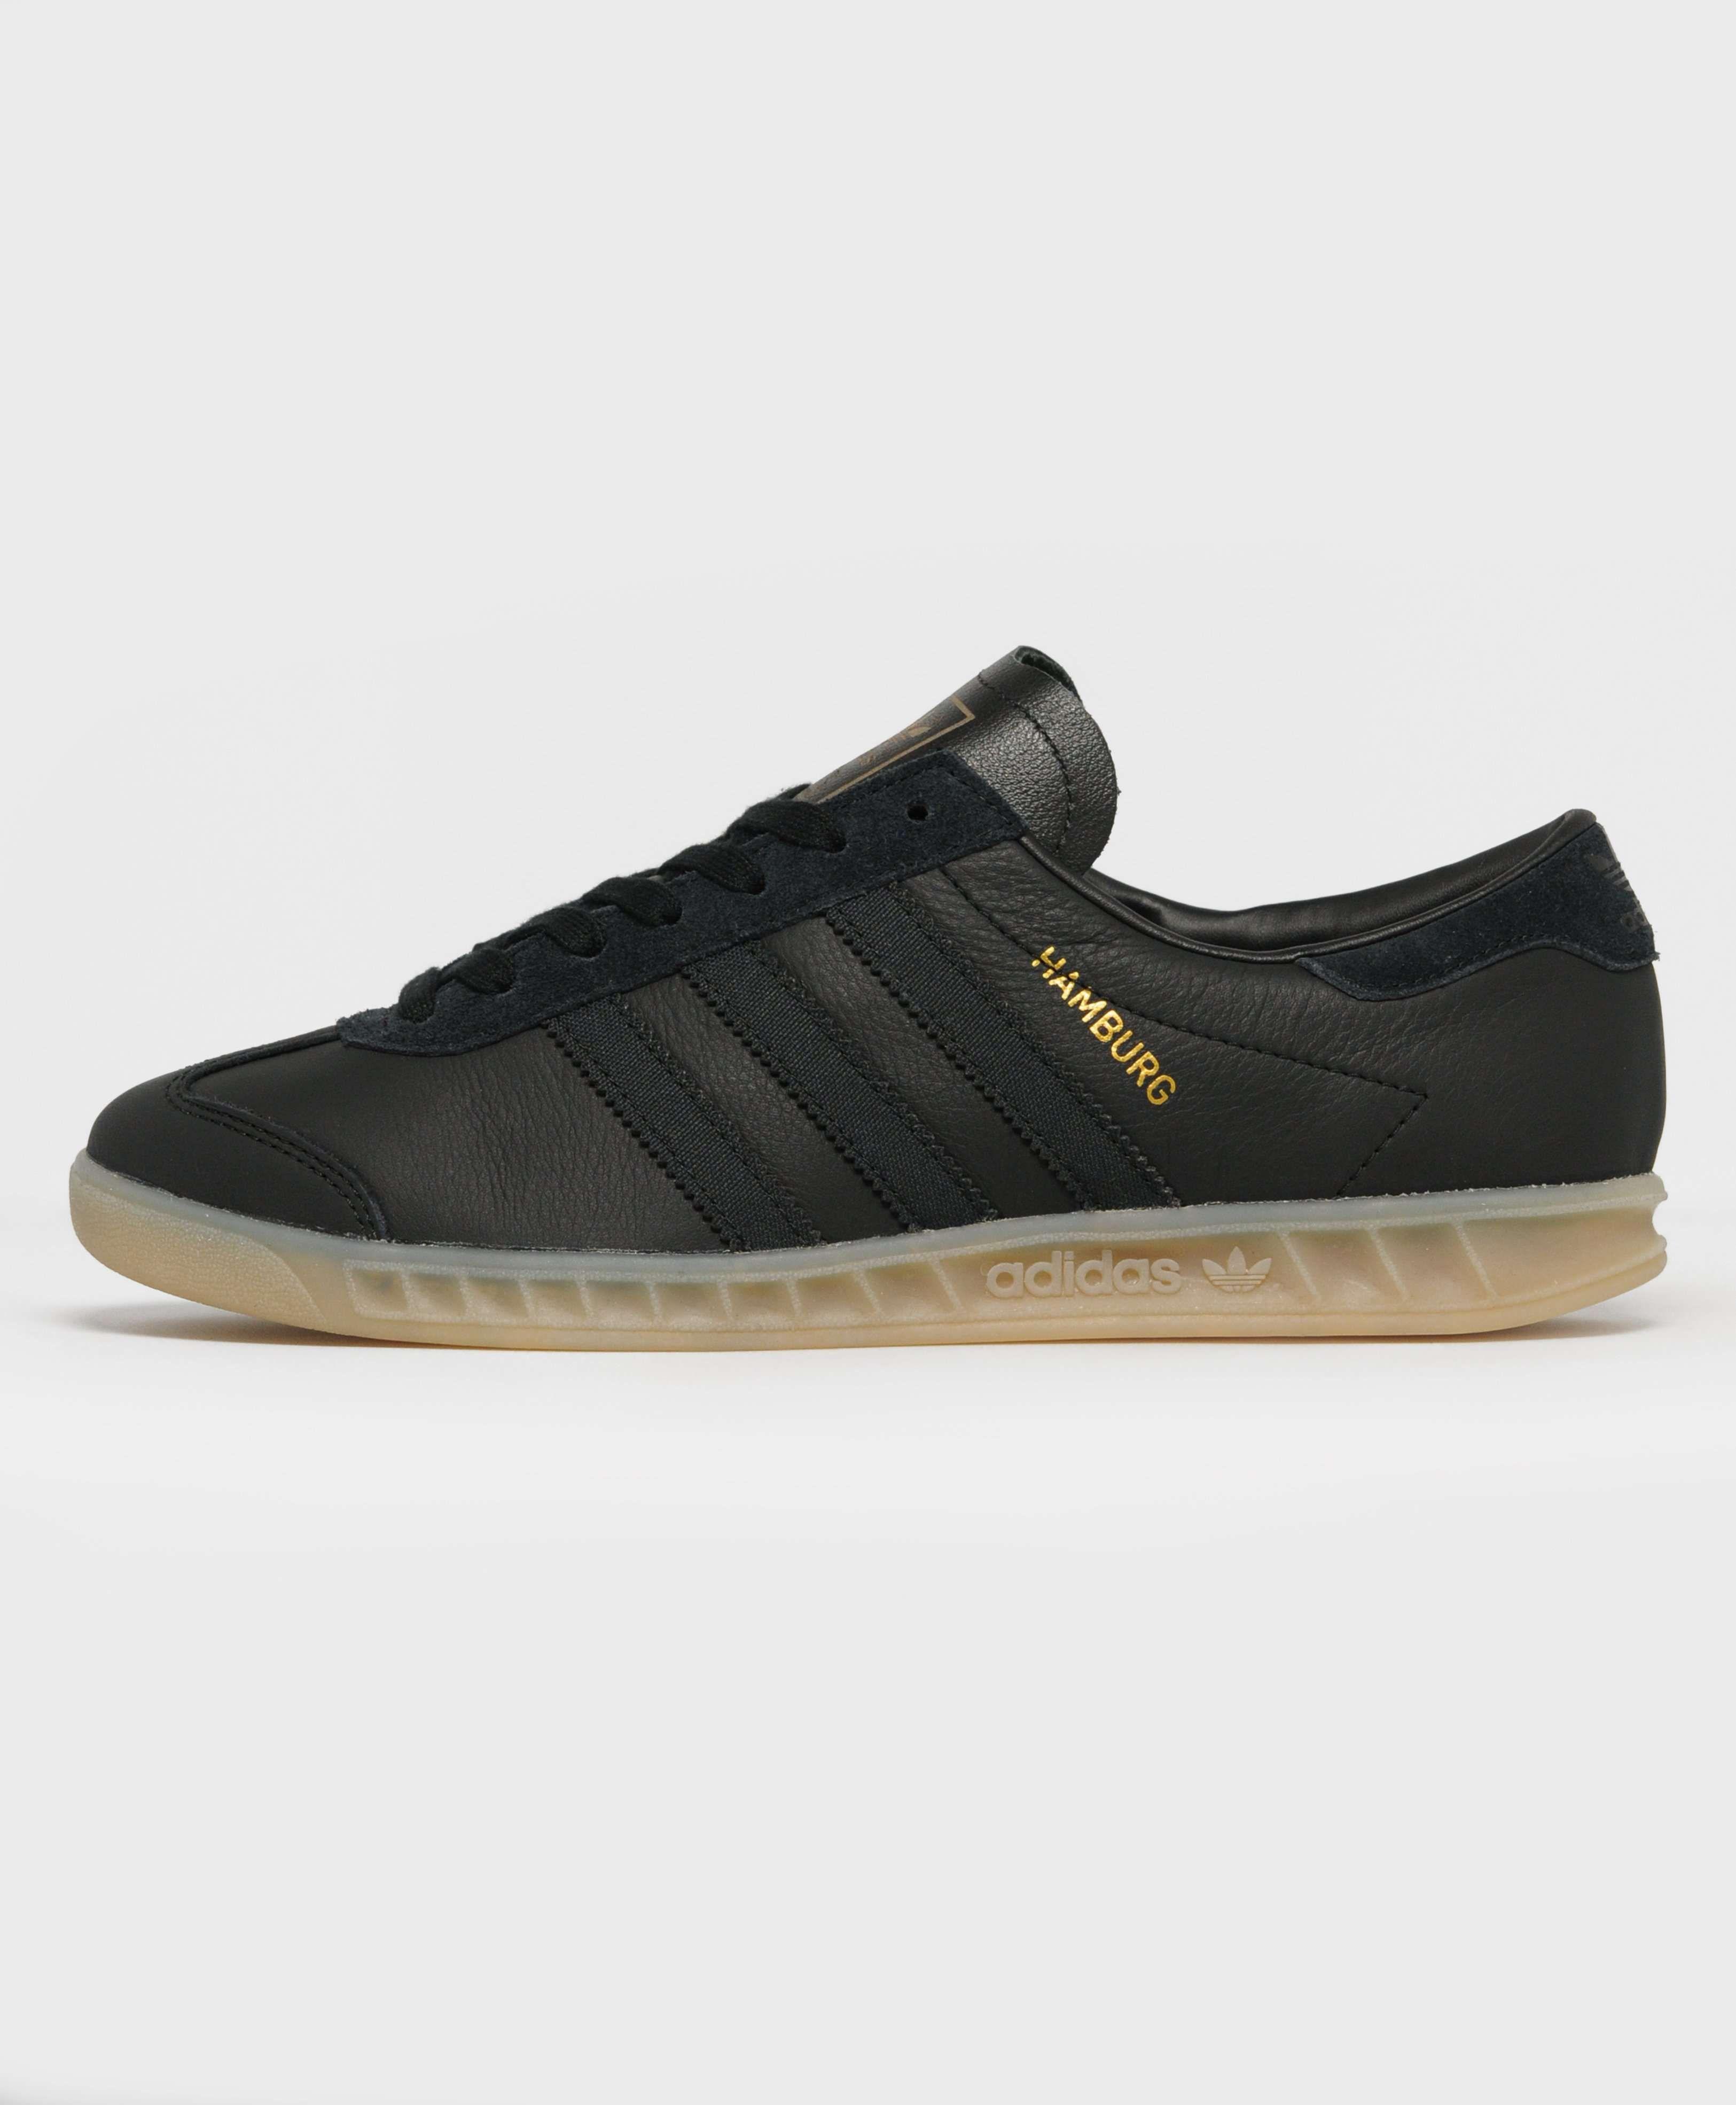 adidas Originals Hamburg | Adidas, Men's fashion brands